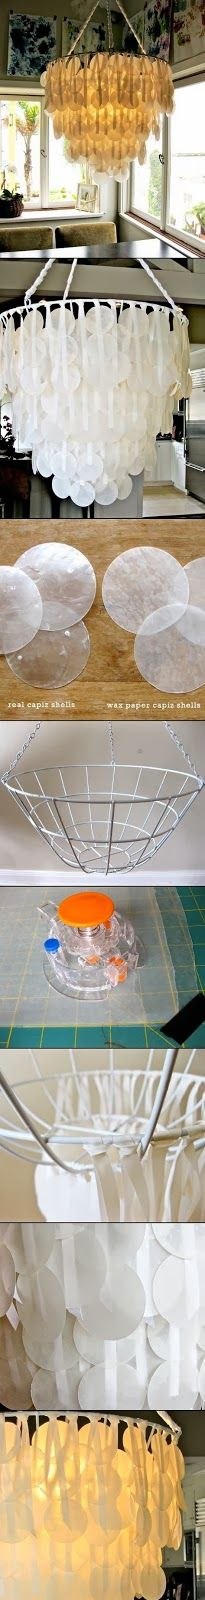 DIY PROJECT:PAPER CAPIZ SHELL CHANDELIER